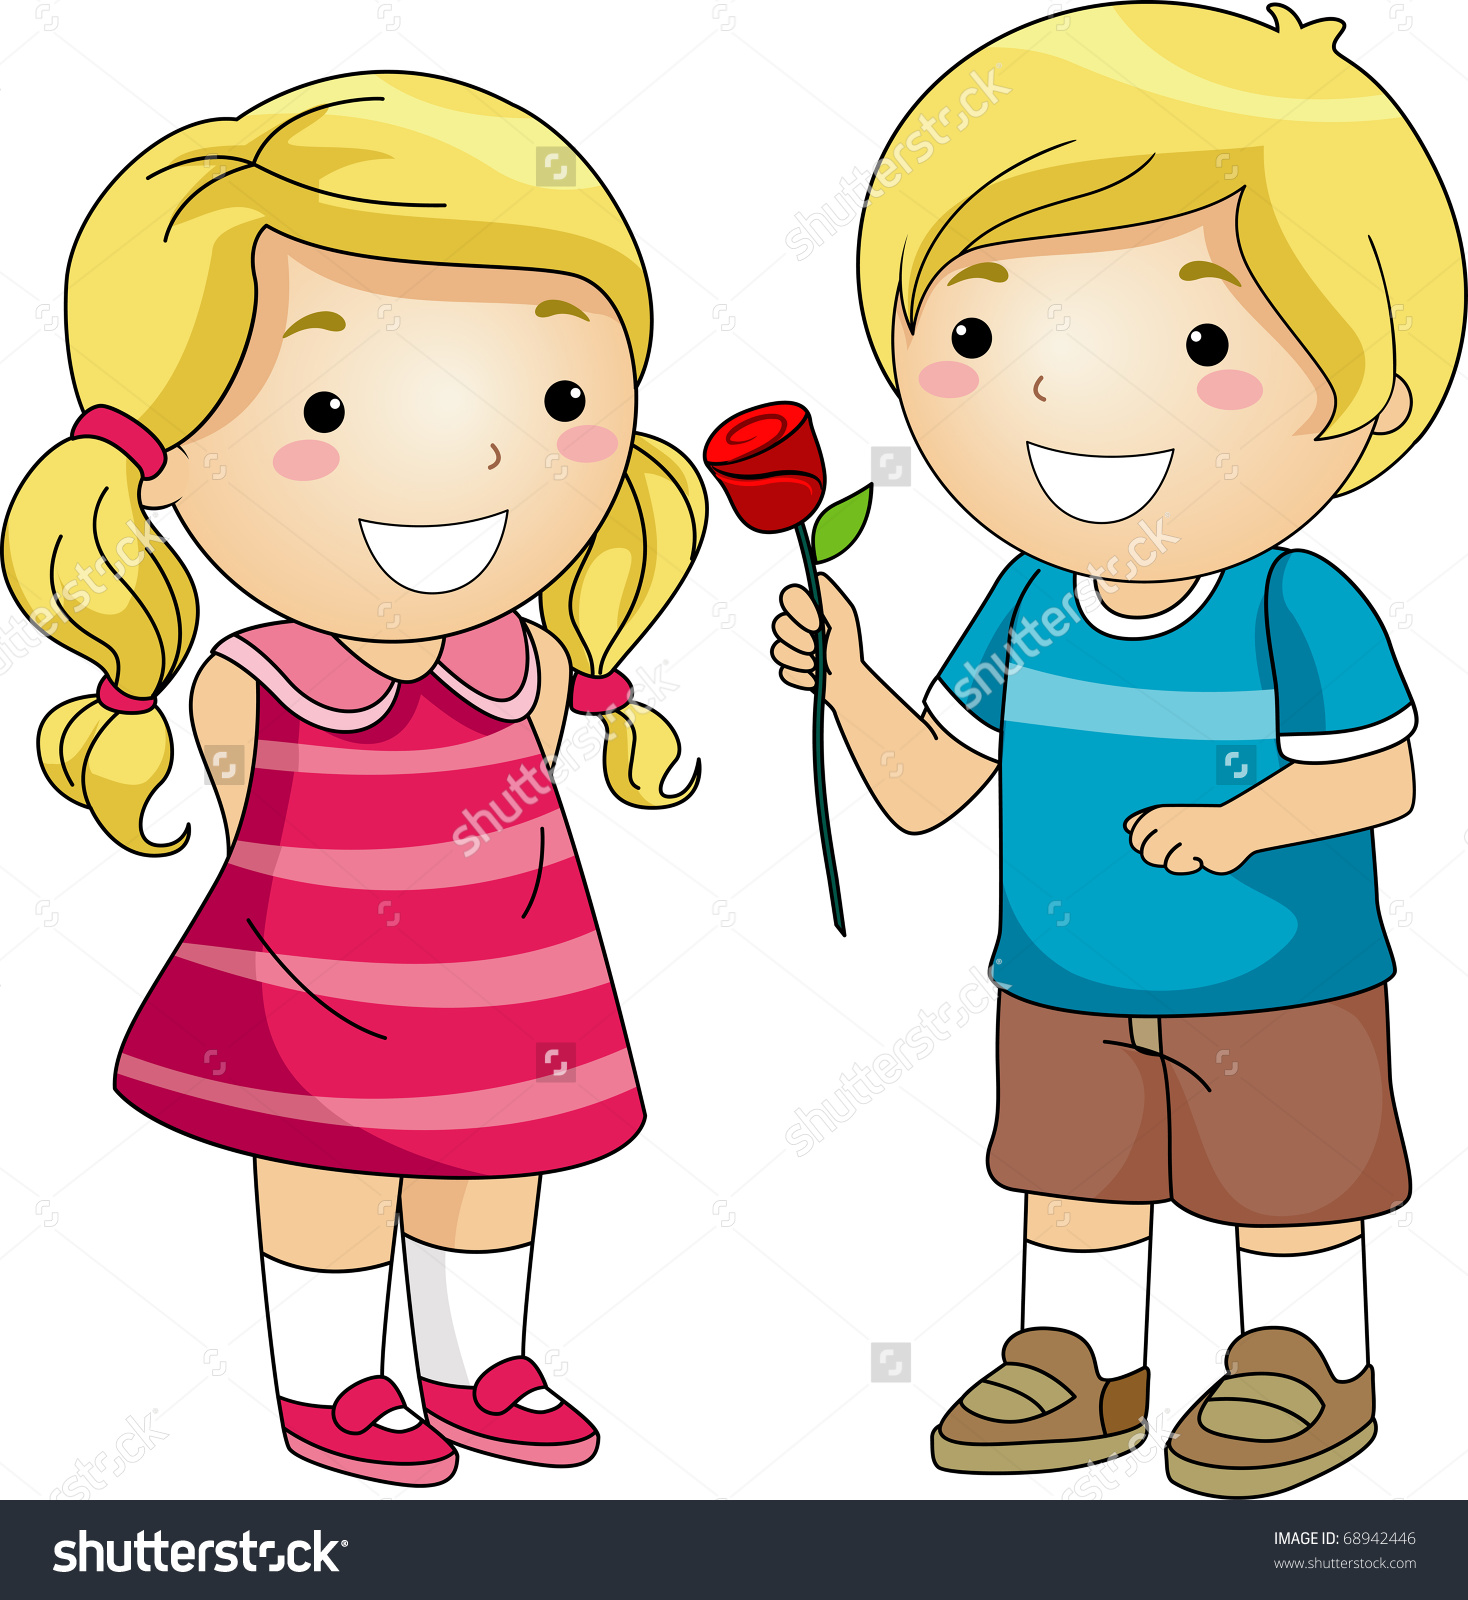 A boy giving a flower to a girl clipart jpg transparent download A boy giving a flower to a girl clipart - ClipartFest jpg transparent download